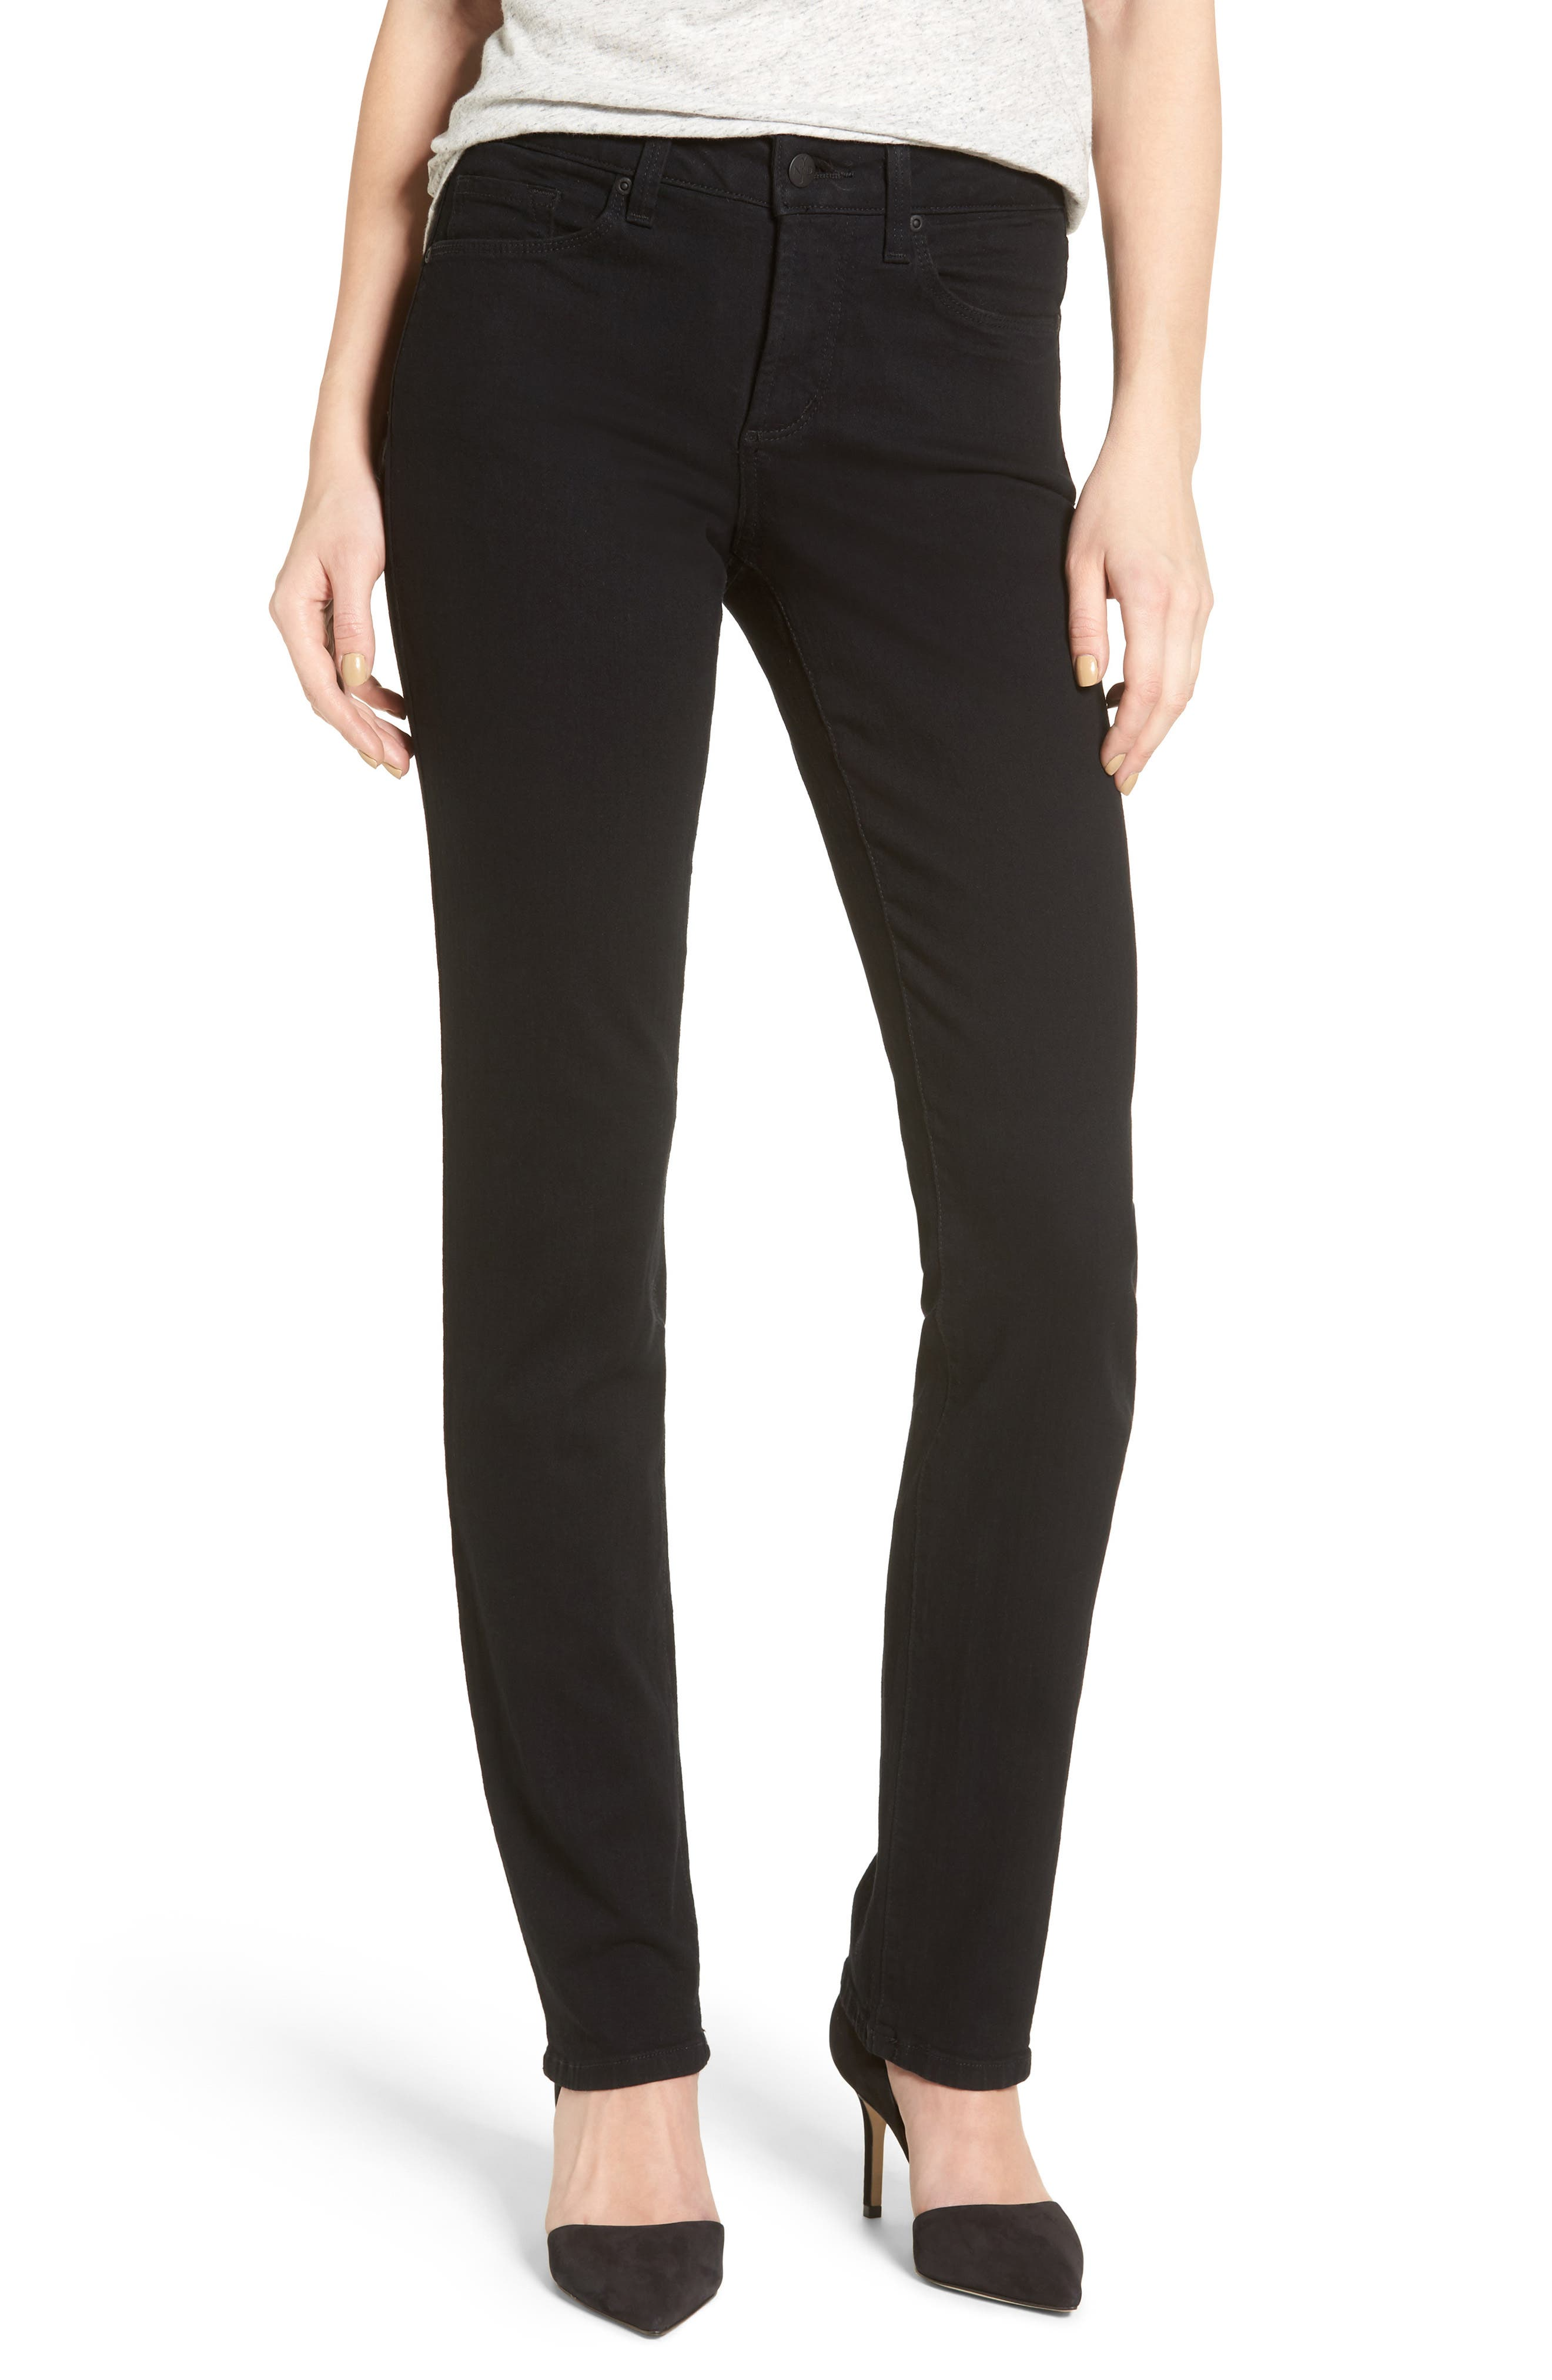 Main Image - NYDJ Sheri Stretch Skinny Jeans (Long)